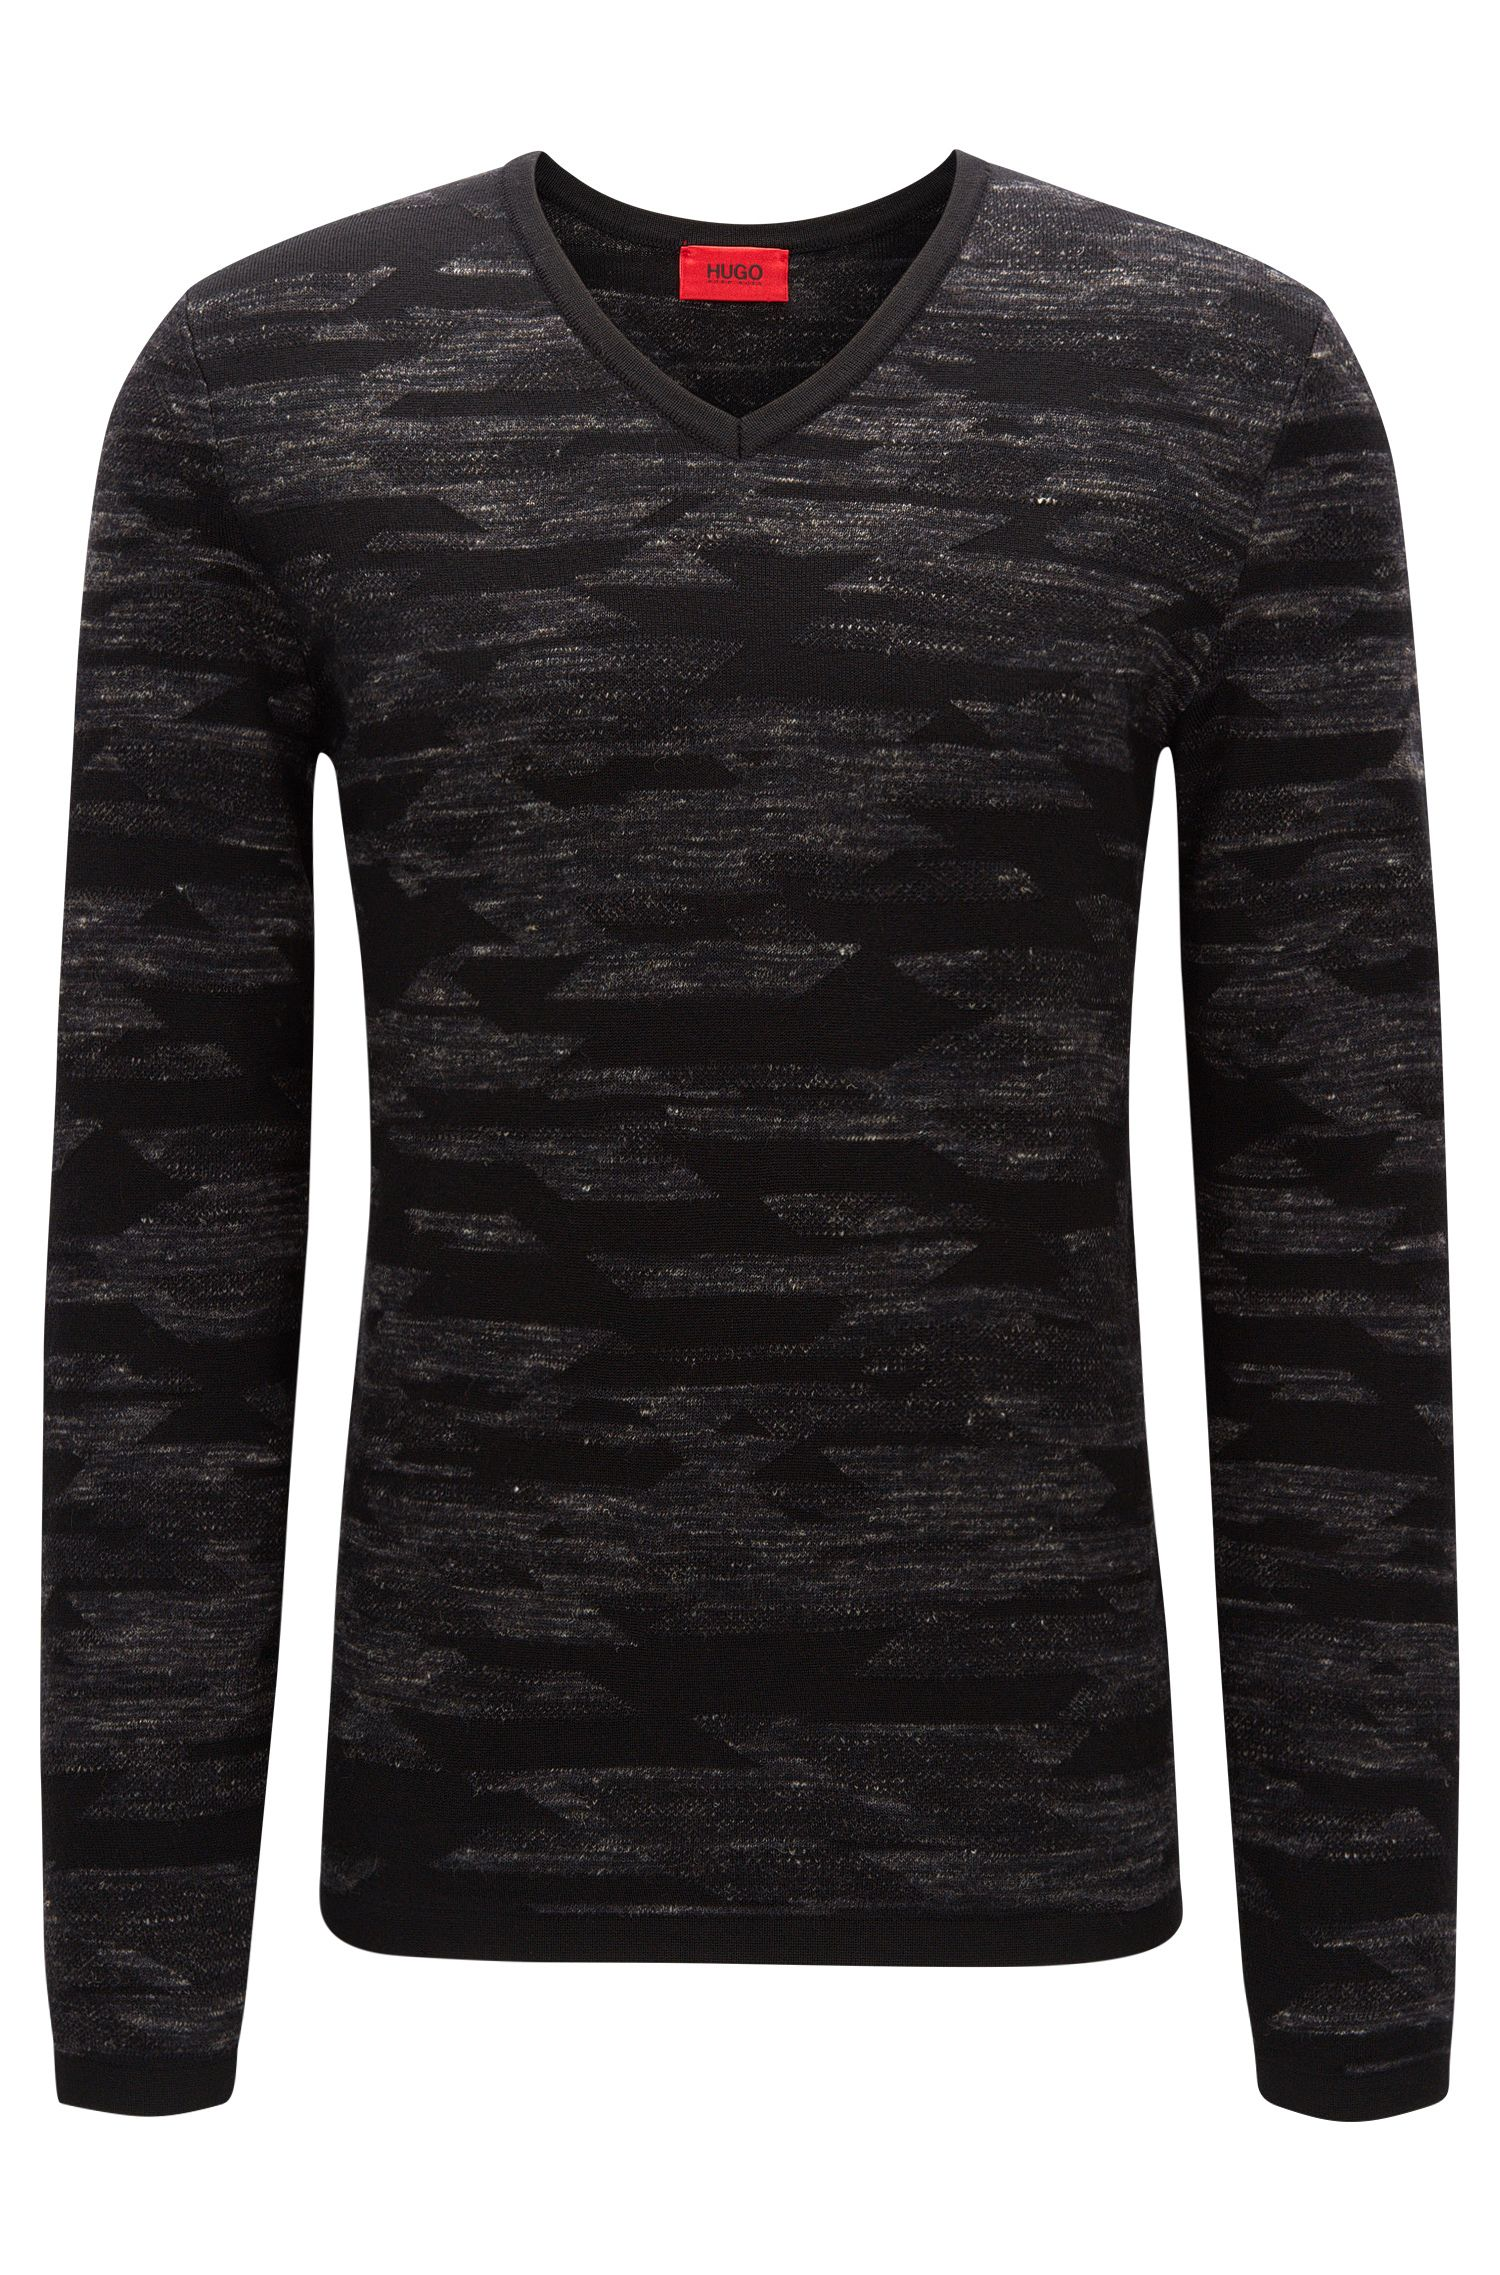 Wool Blend Geometric Print Sweater | Sindo